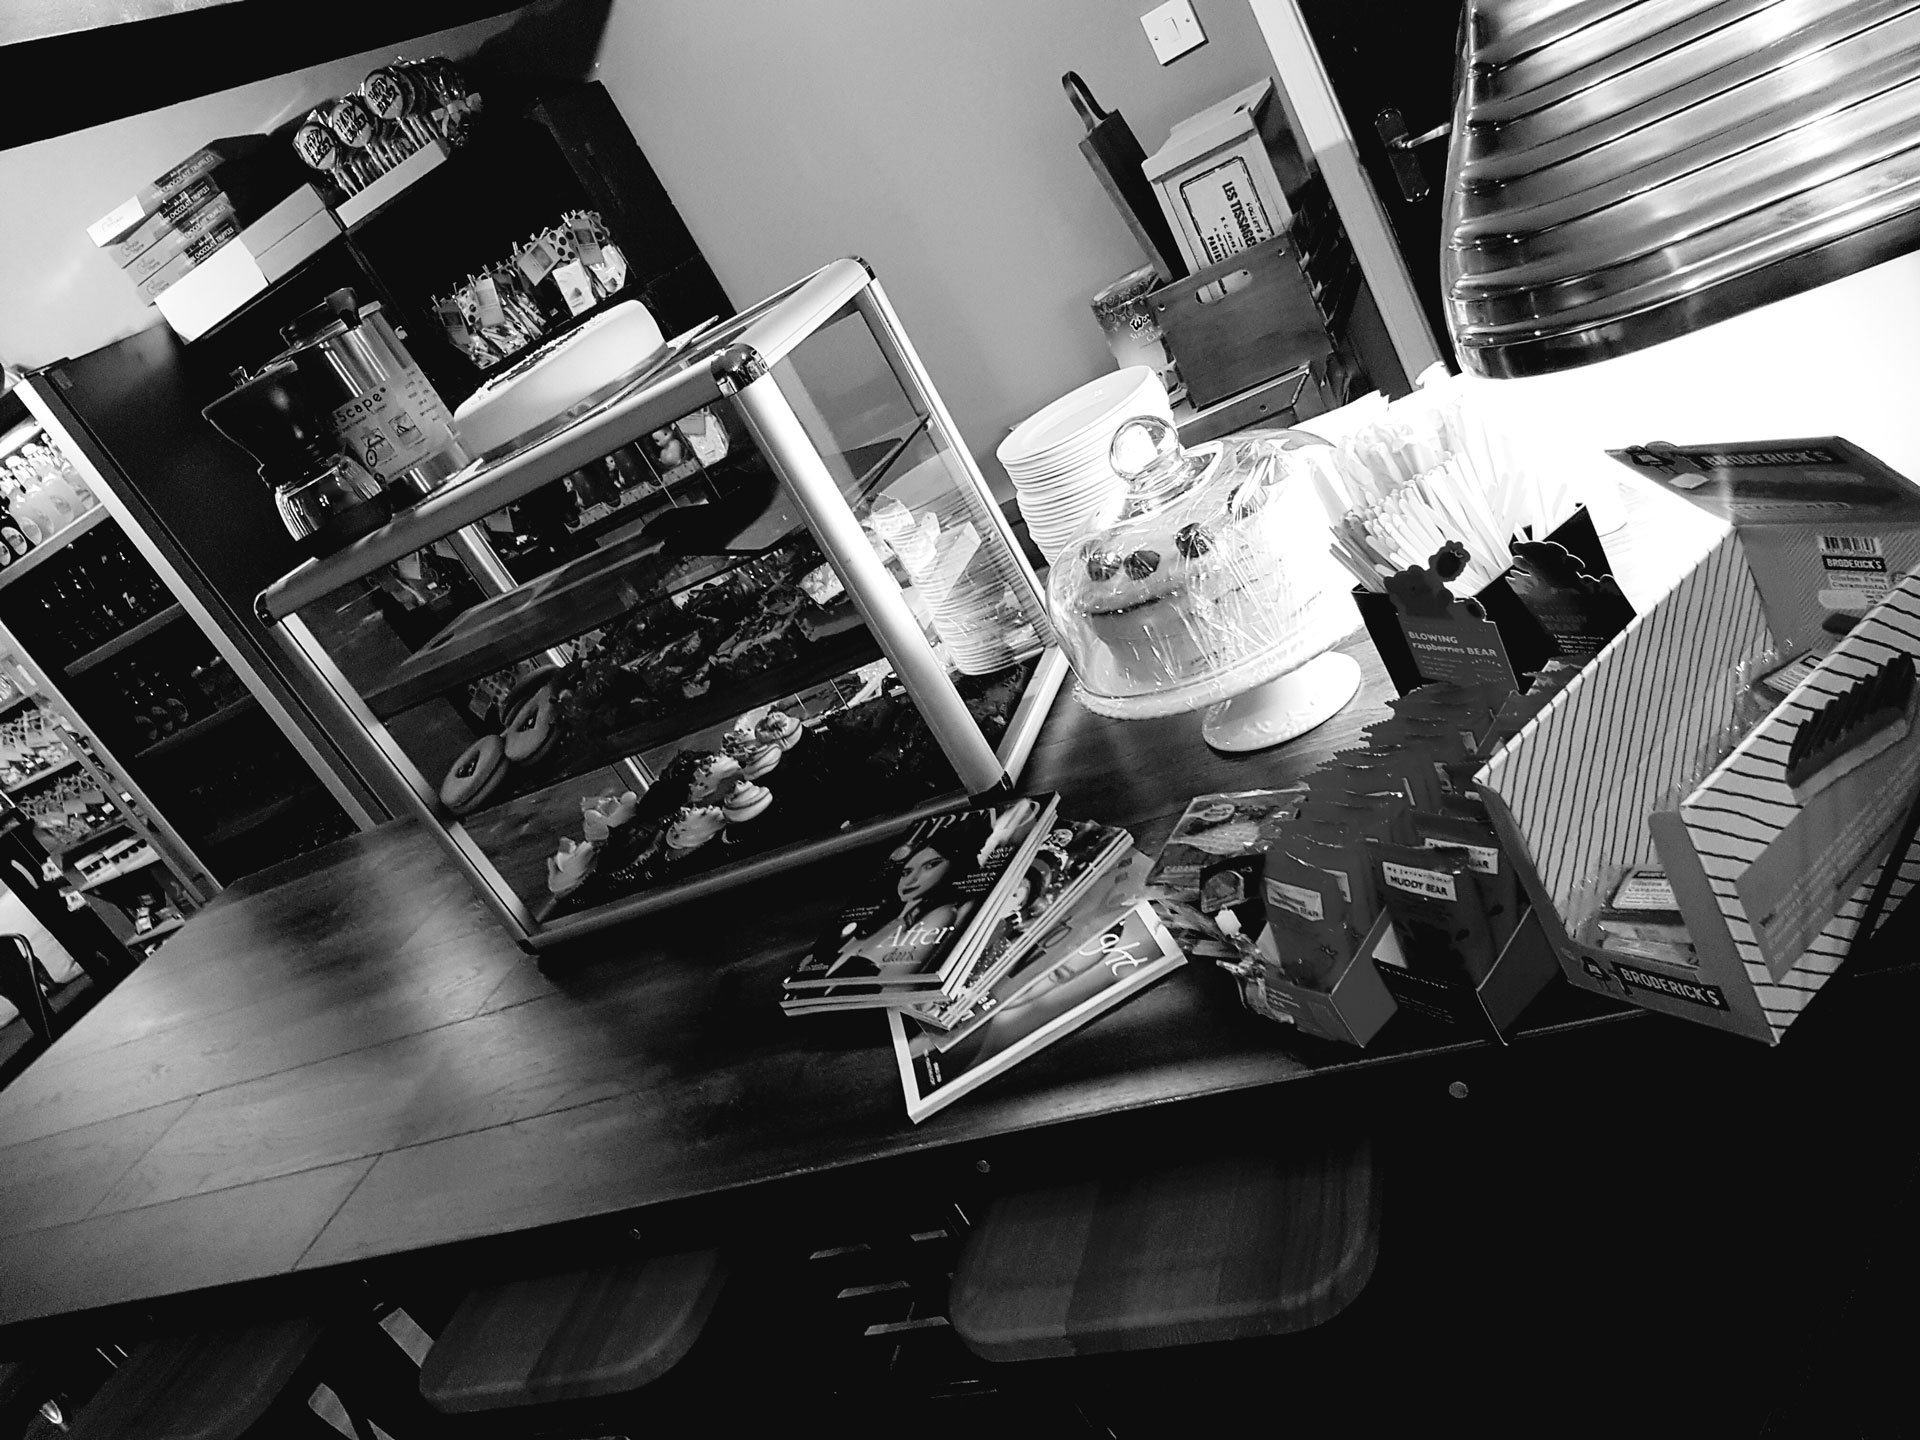 bar view inside the shop